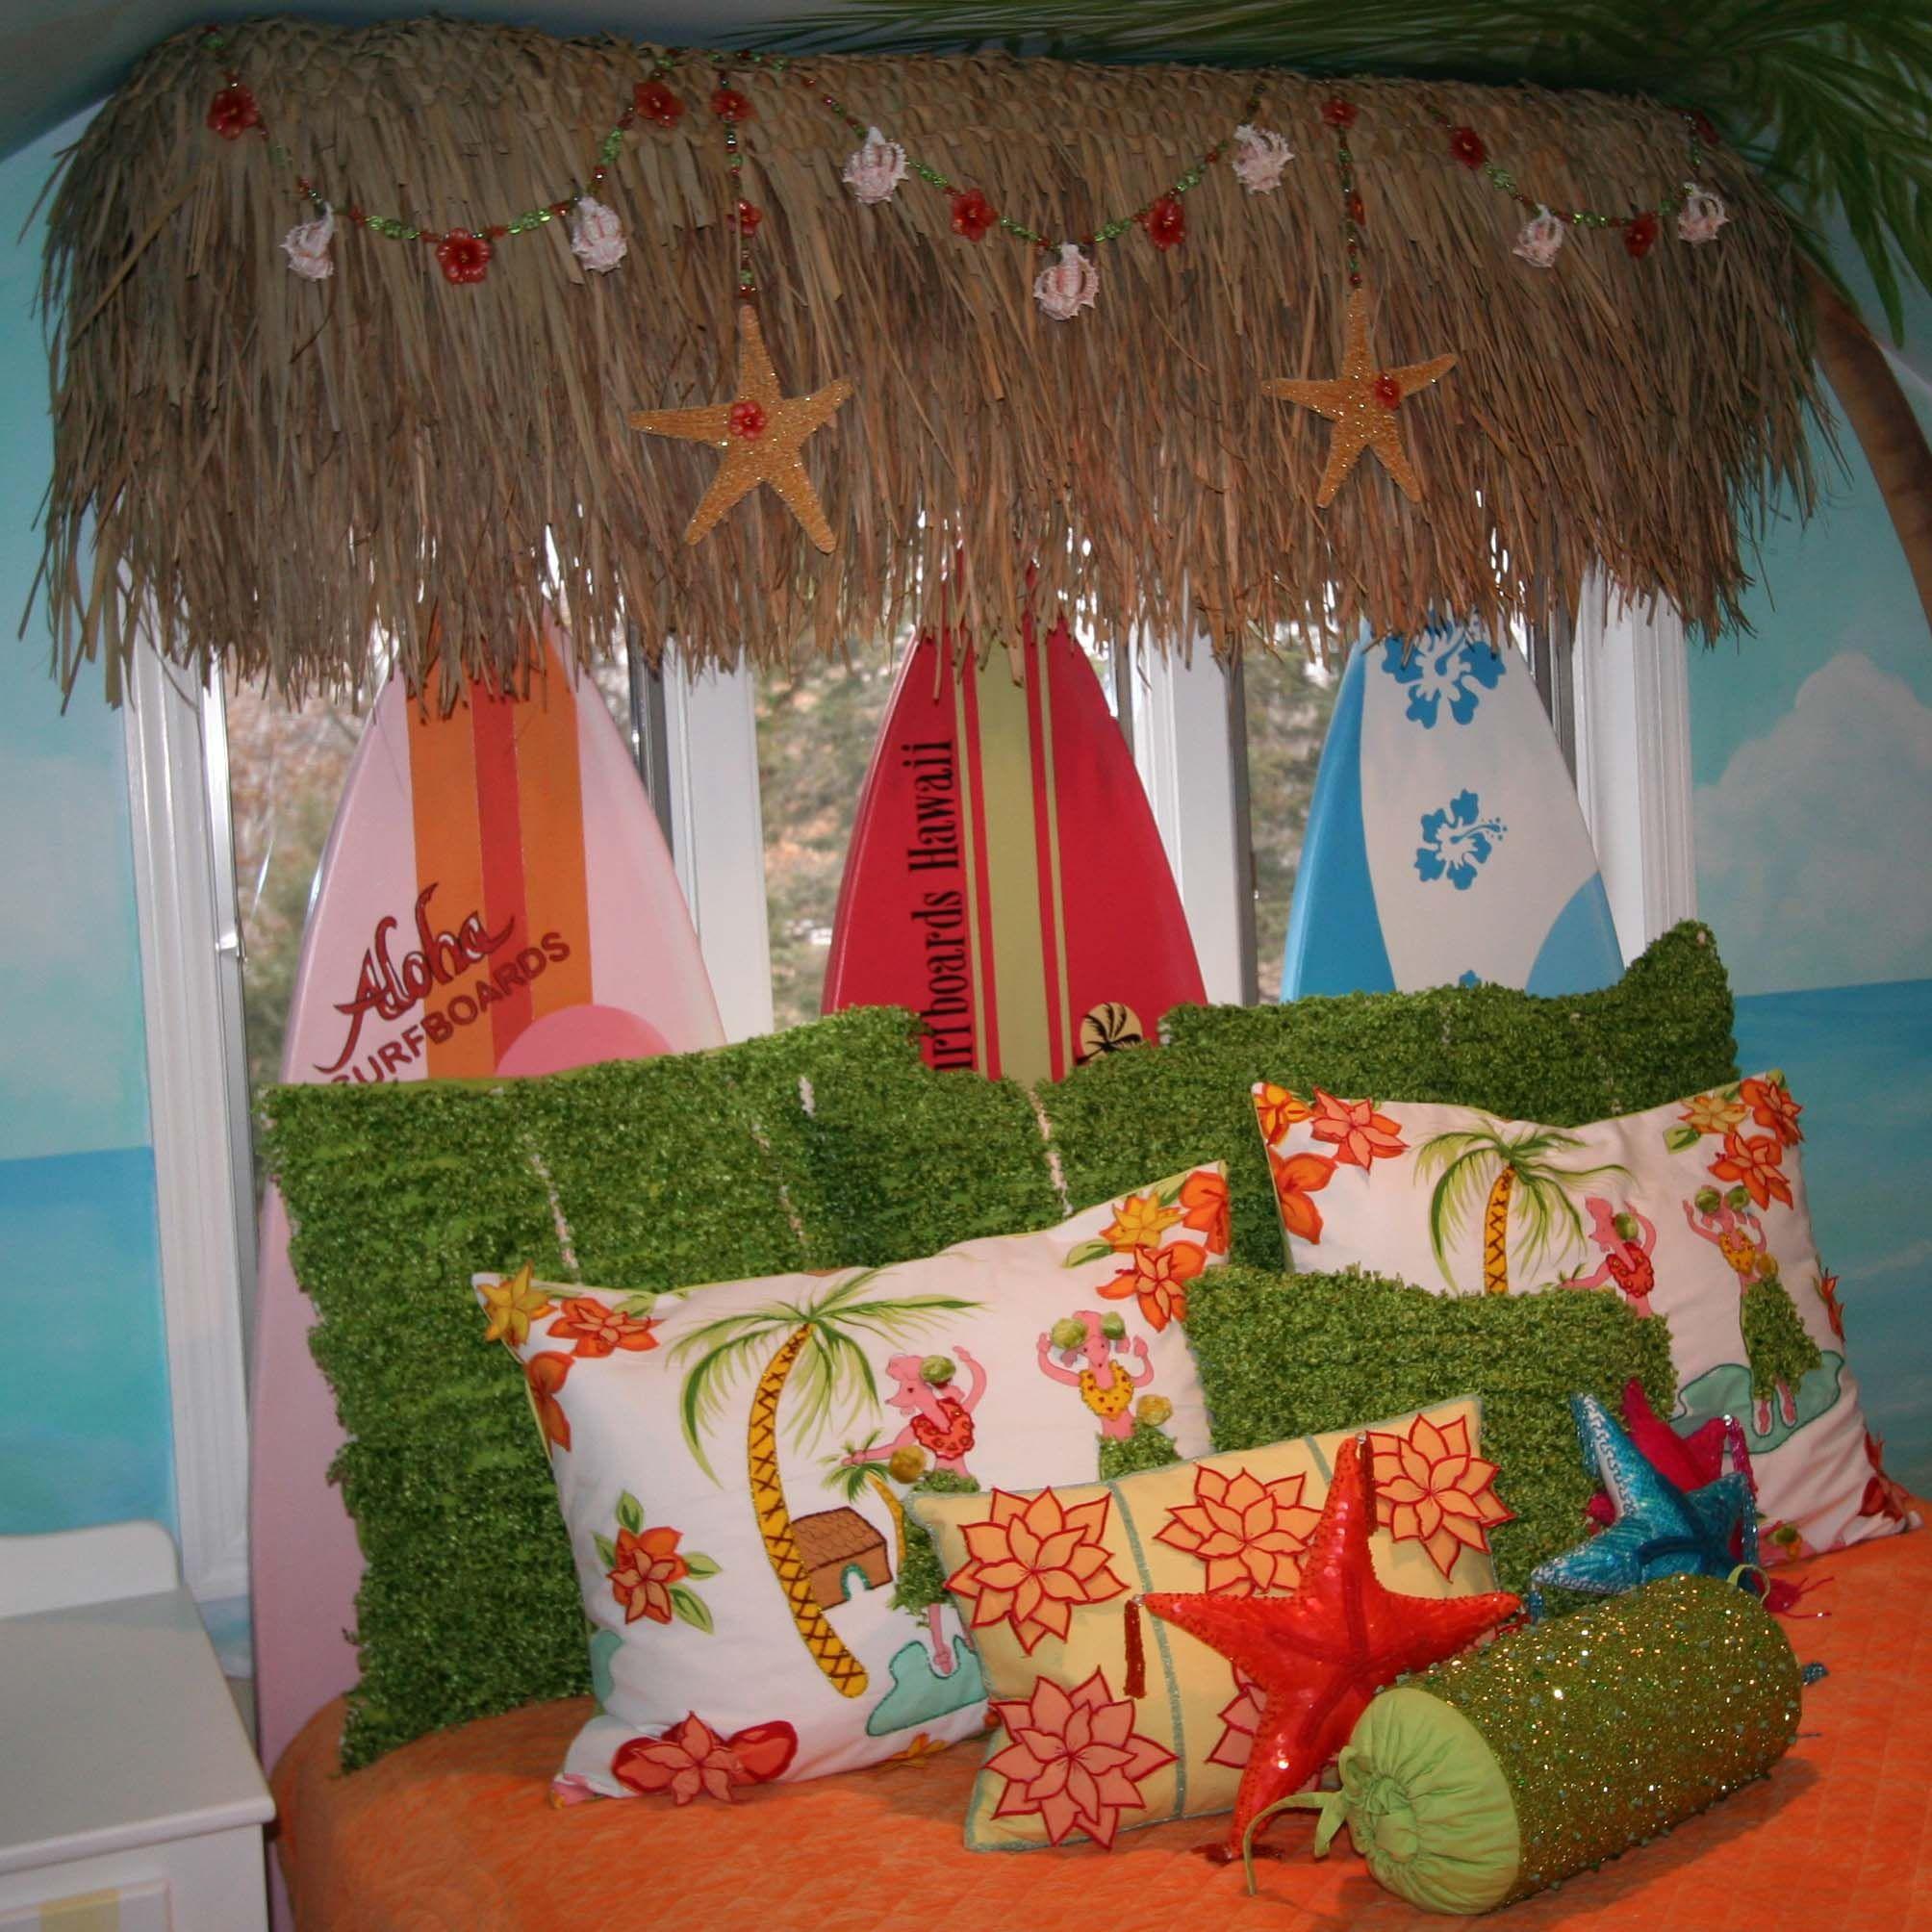 50's Surf Shop, Tiki, Hawaiian Prints, Hula